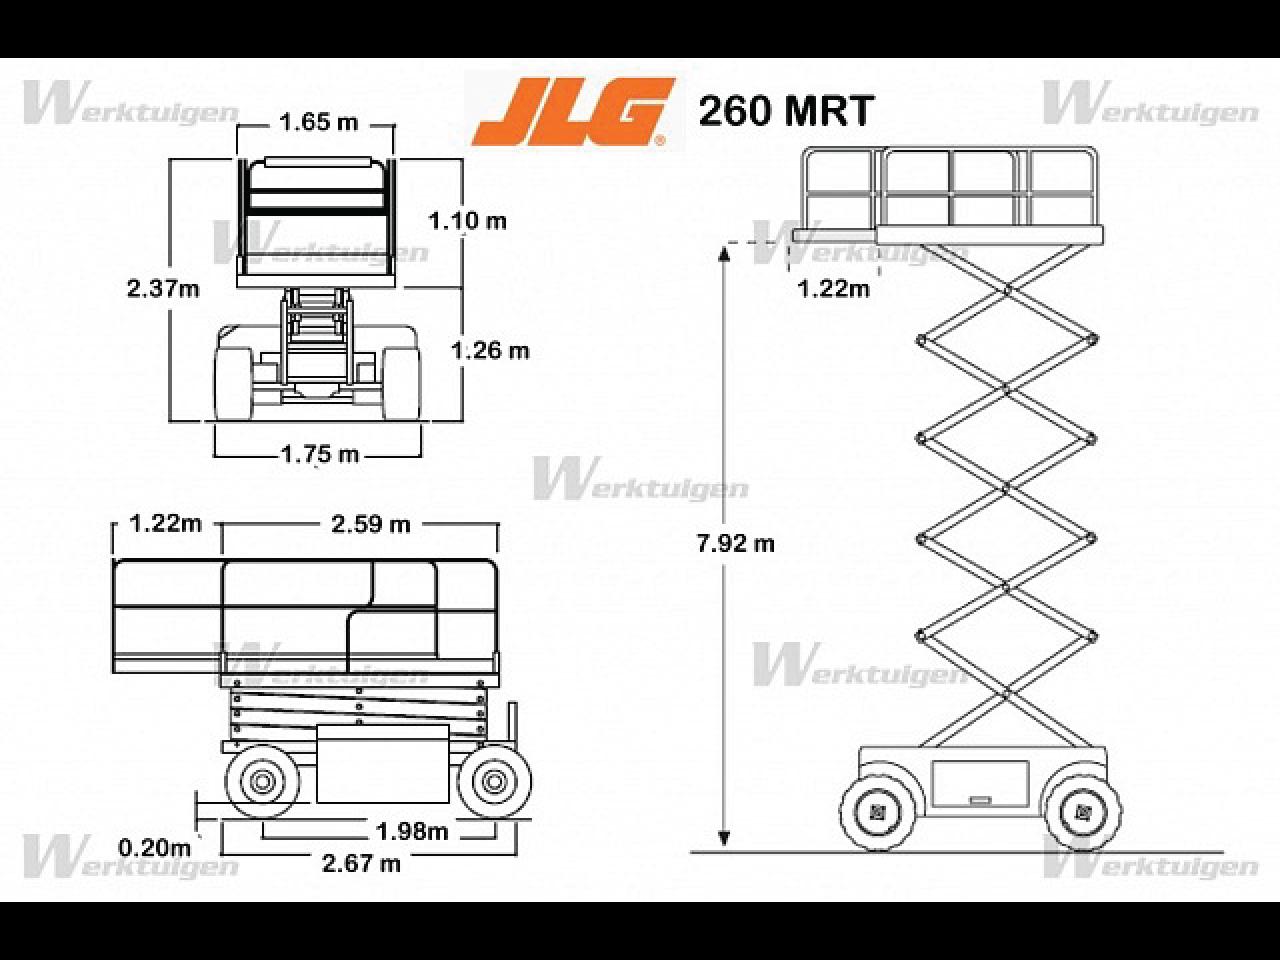 JLG-260-MRT-Scissor-lift-Diagram